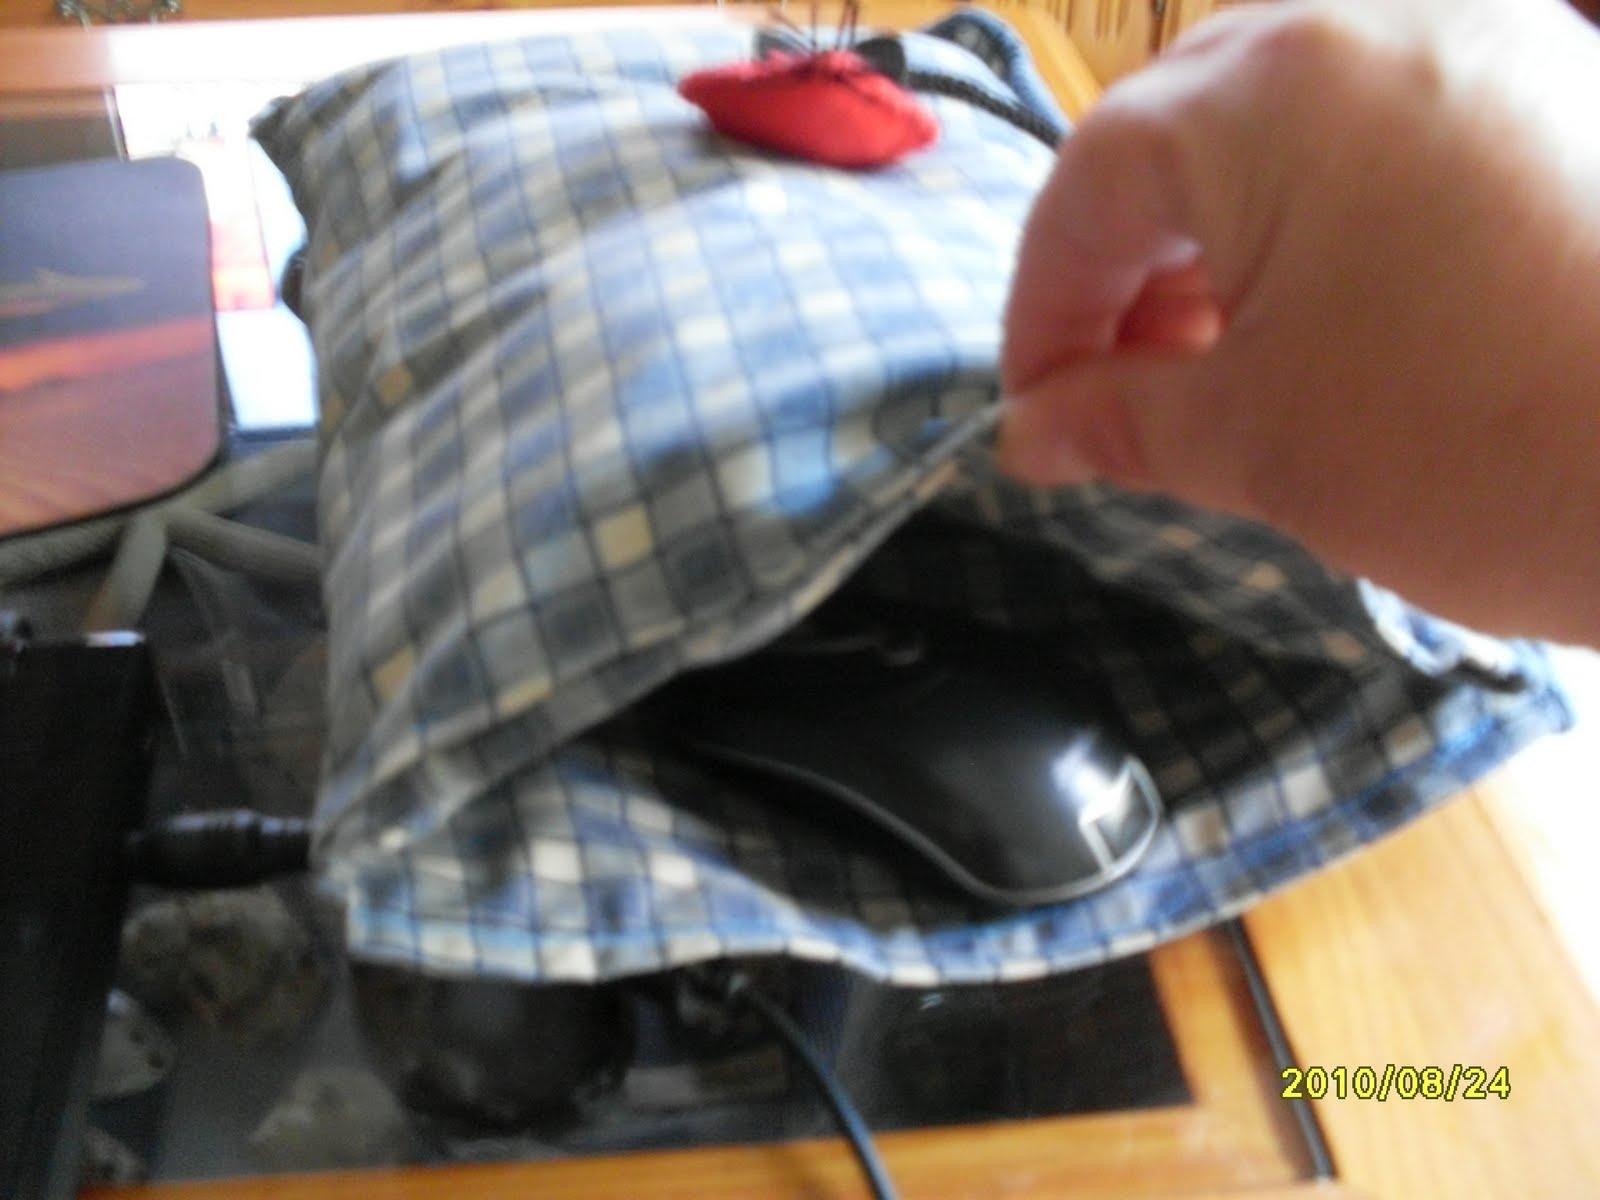 almohadilla, ratón, pc, manos frías, funda, costura